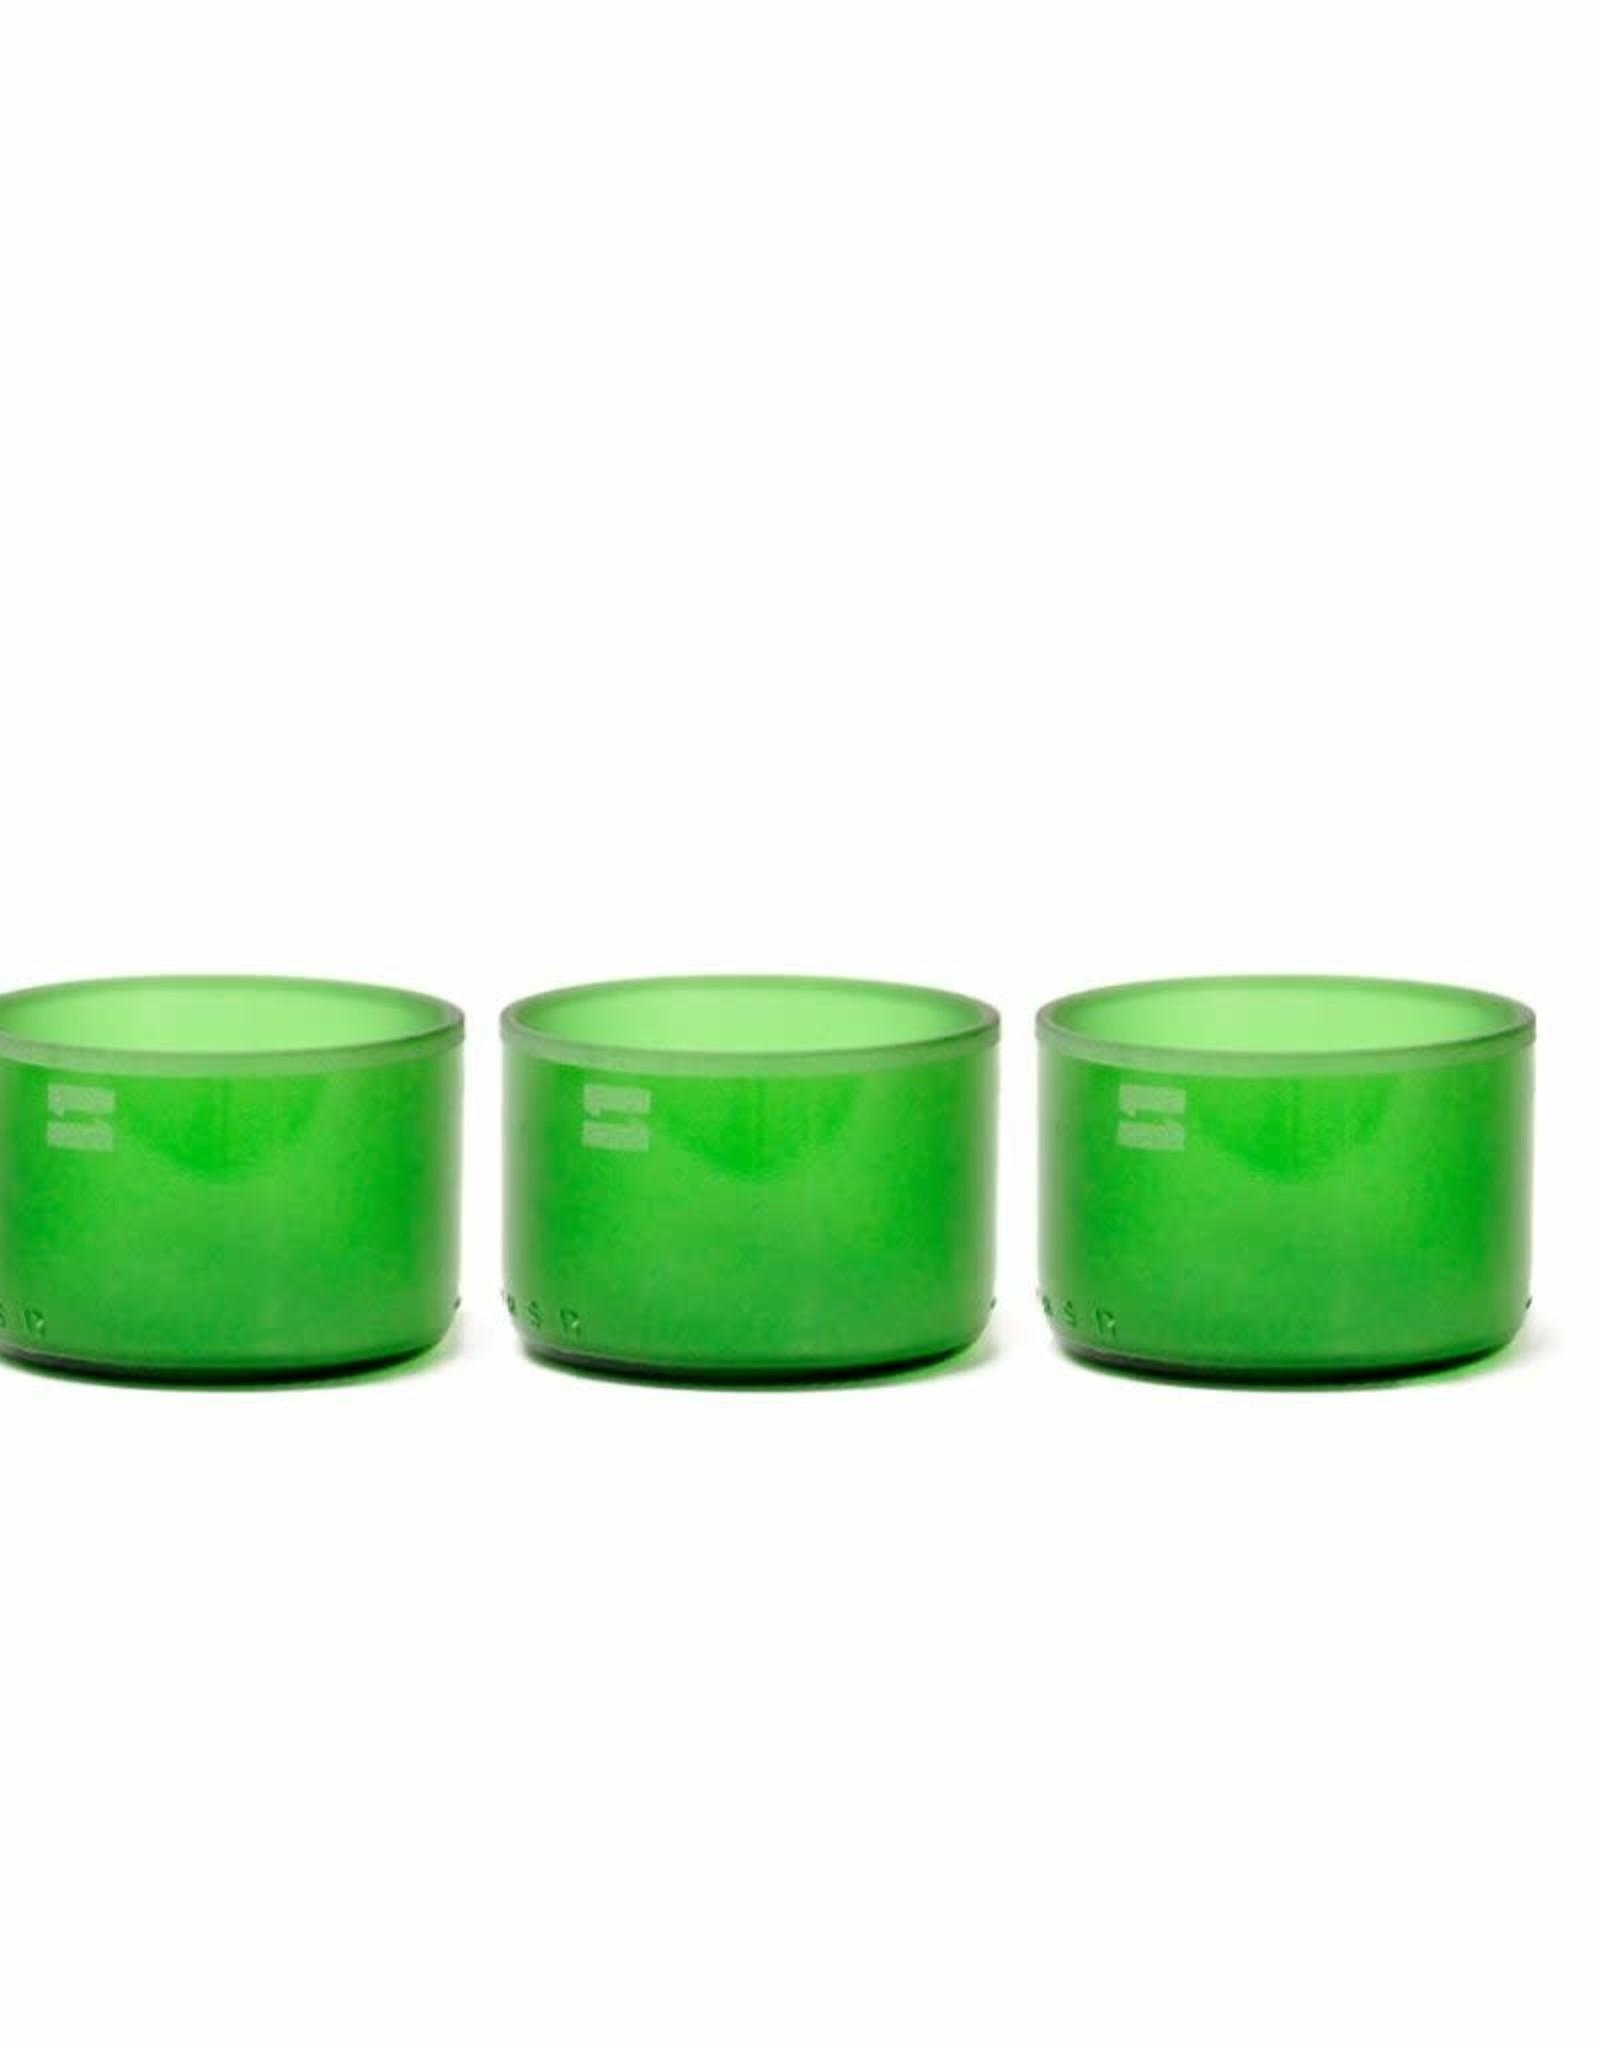 IWAS Bowls 'Green' - 3 multifunctionele kommetjes